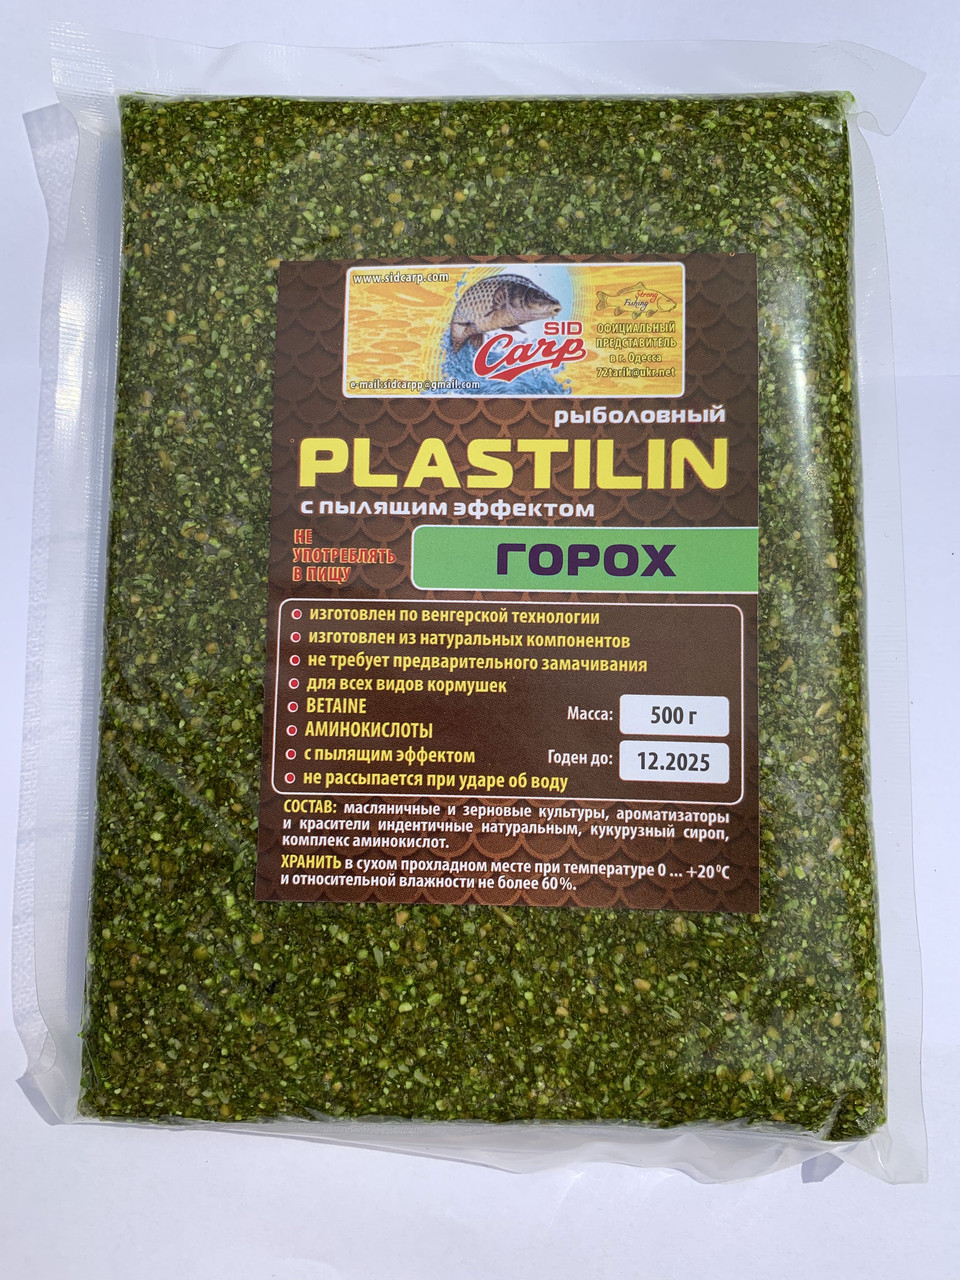 Пластилин пылящий Sid Carp 500g Горох (95200100)